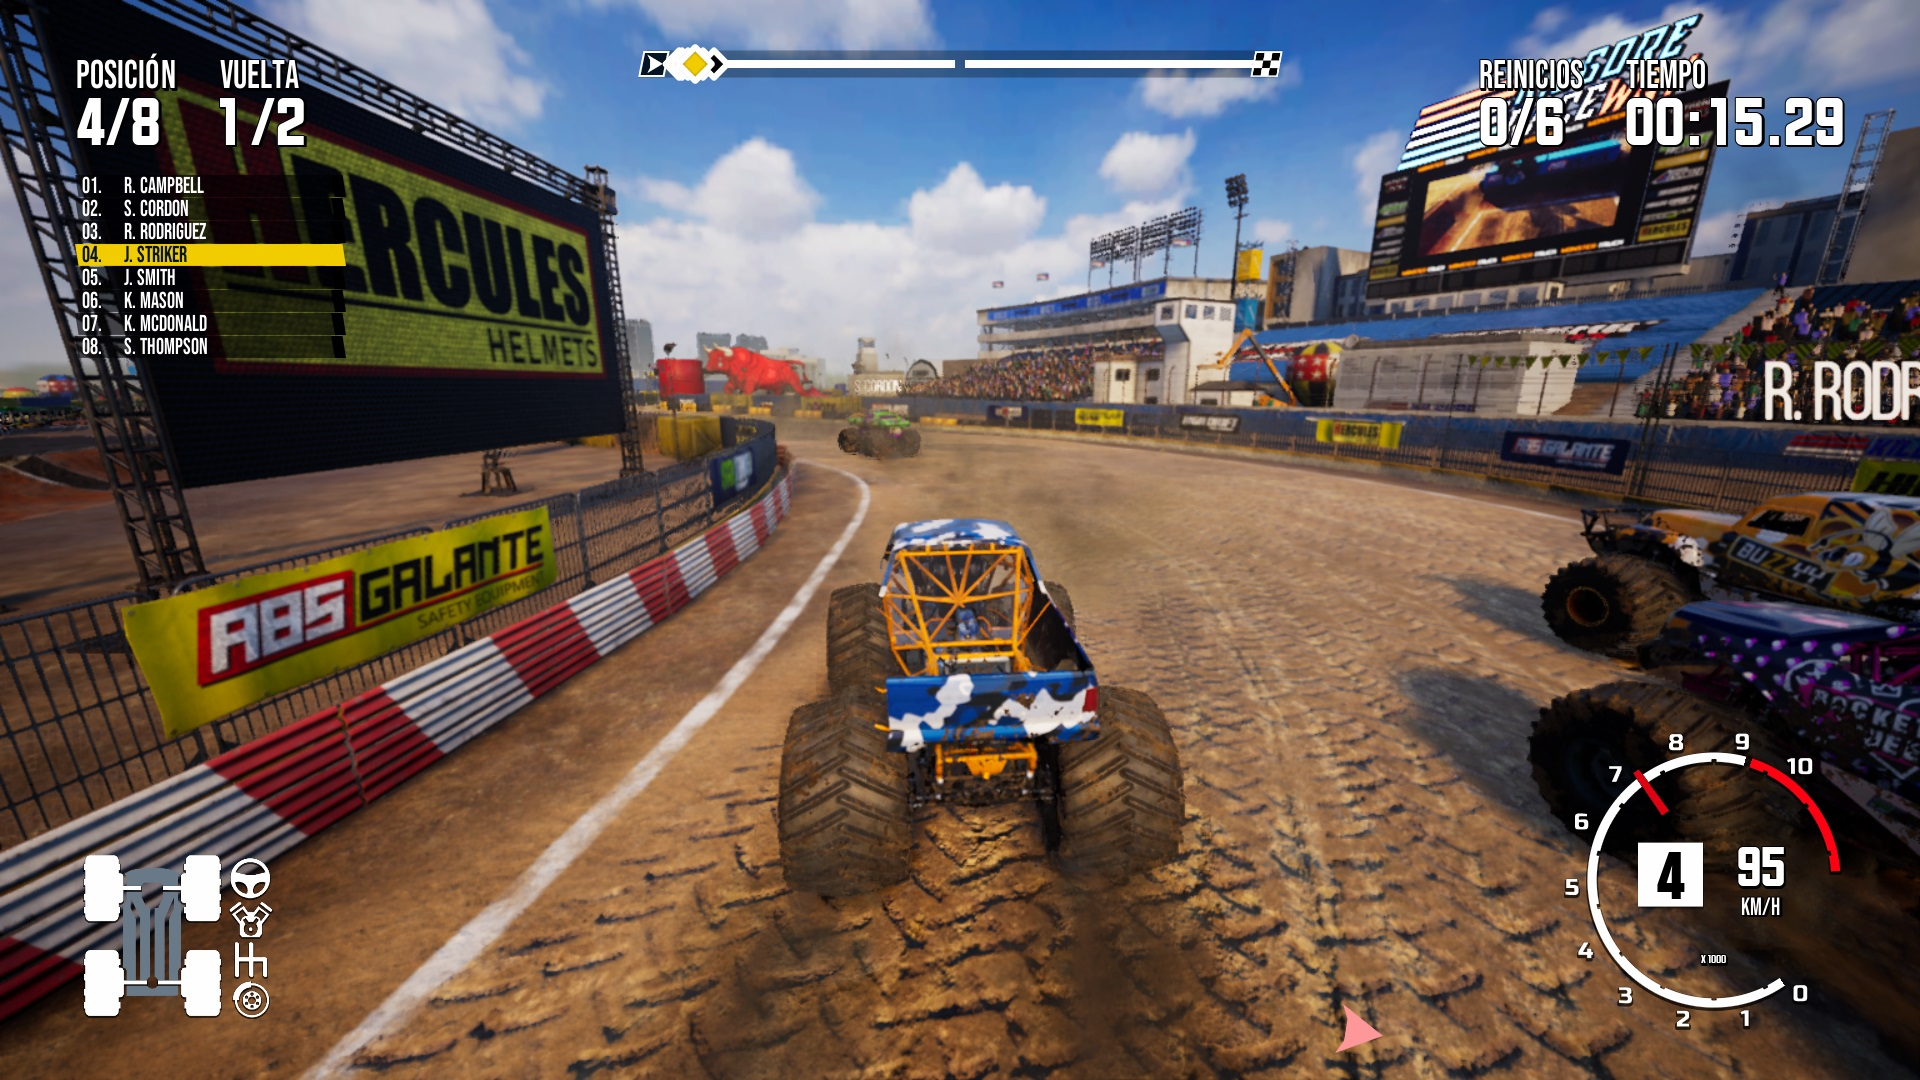 Análisis de Monster Truck Championship